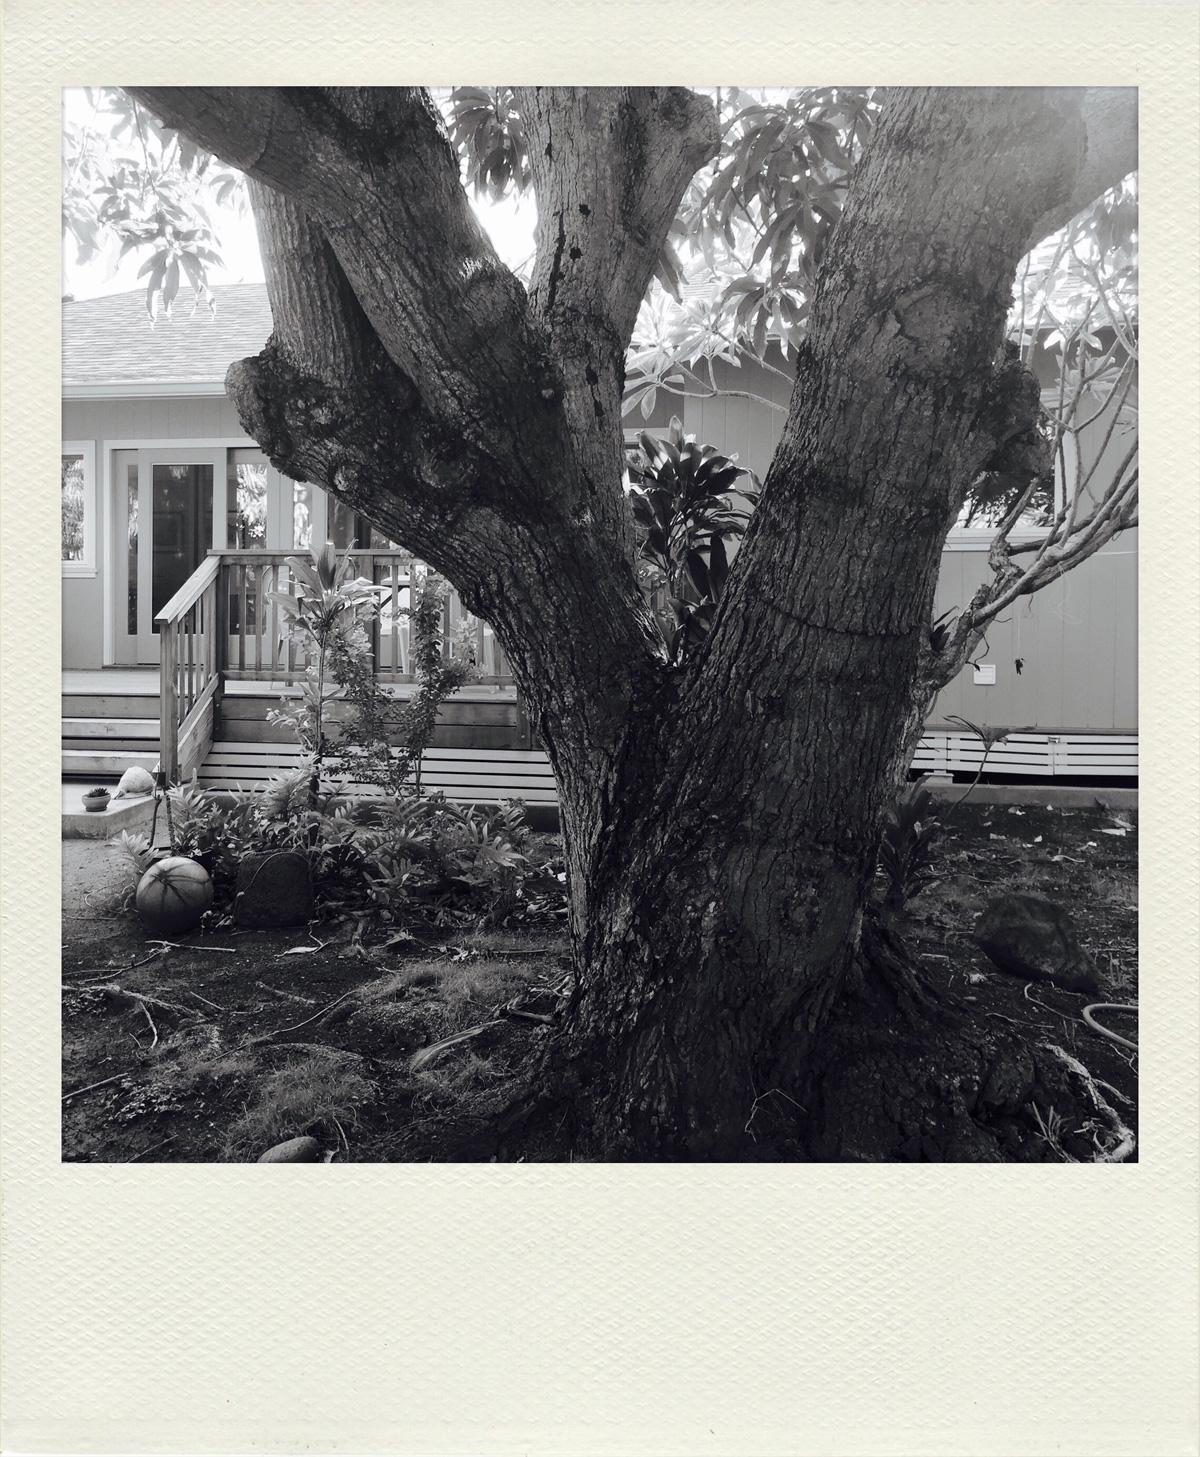 Bonnie's tree 2016